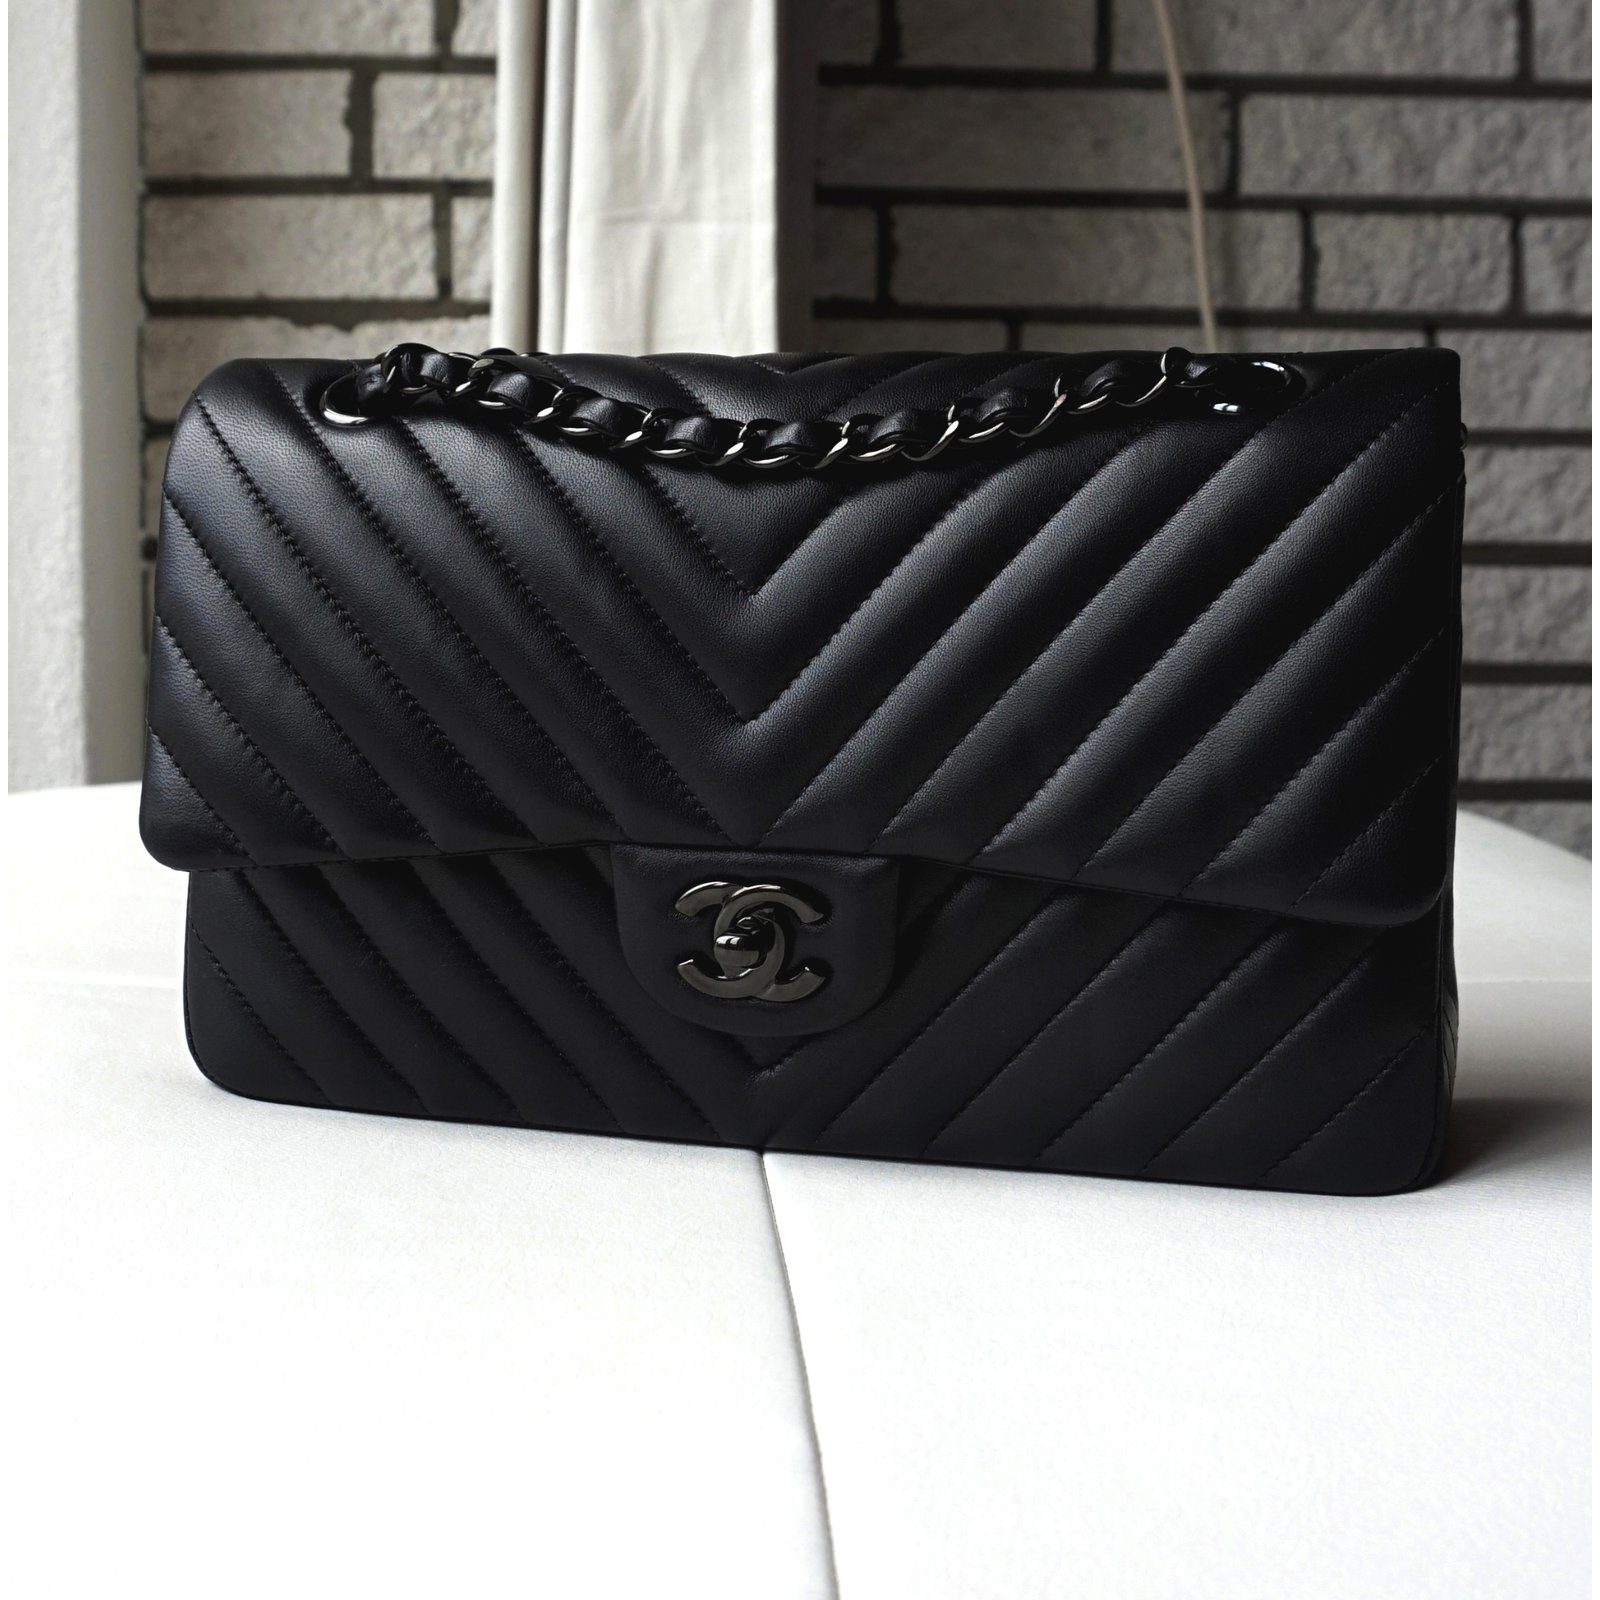 Chanel Timeless Handbags Lambskin Black ref.20542 - Joli Closet e2d1dbc5ca3e